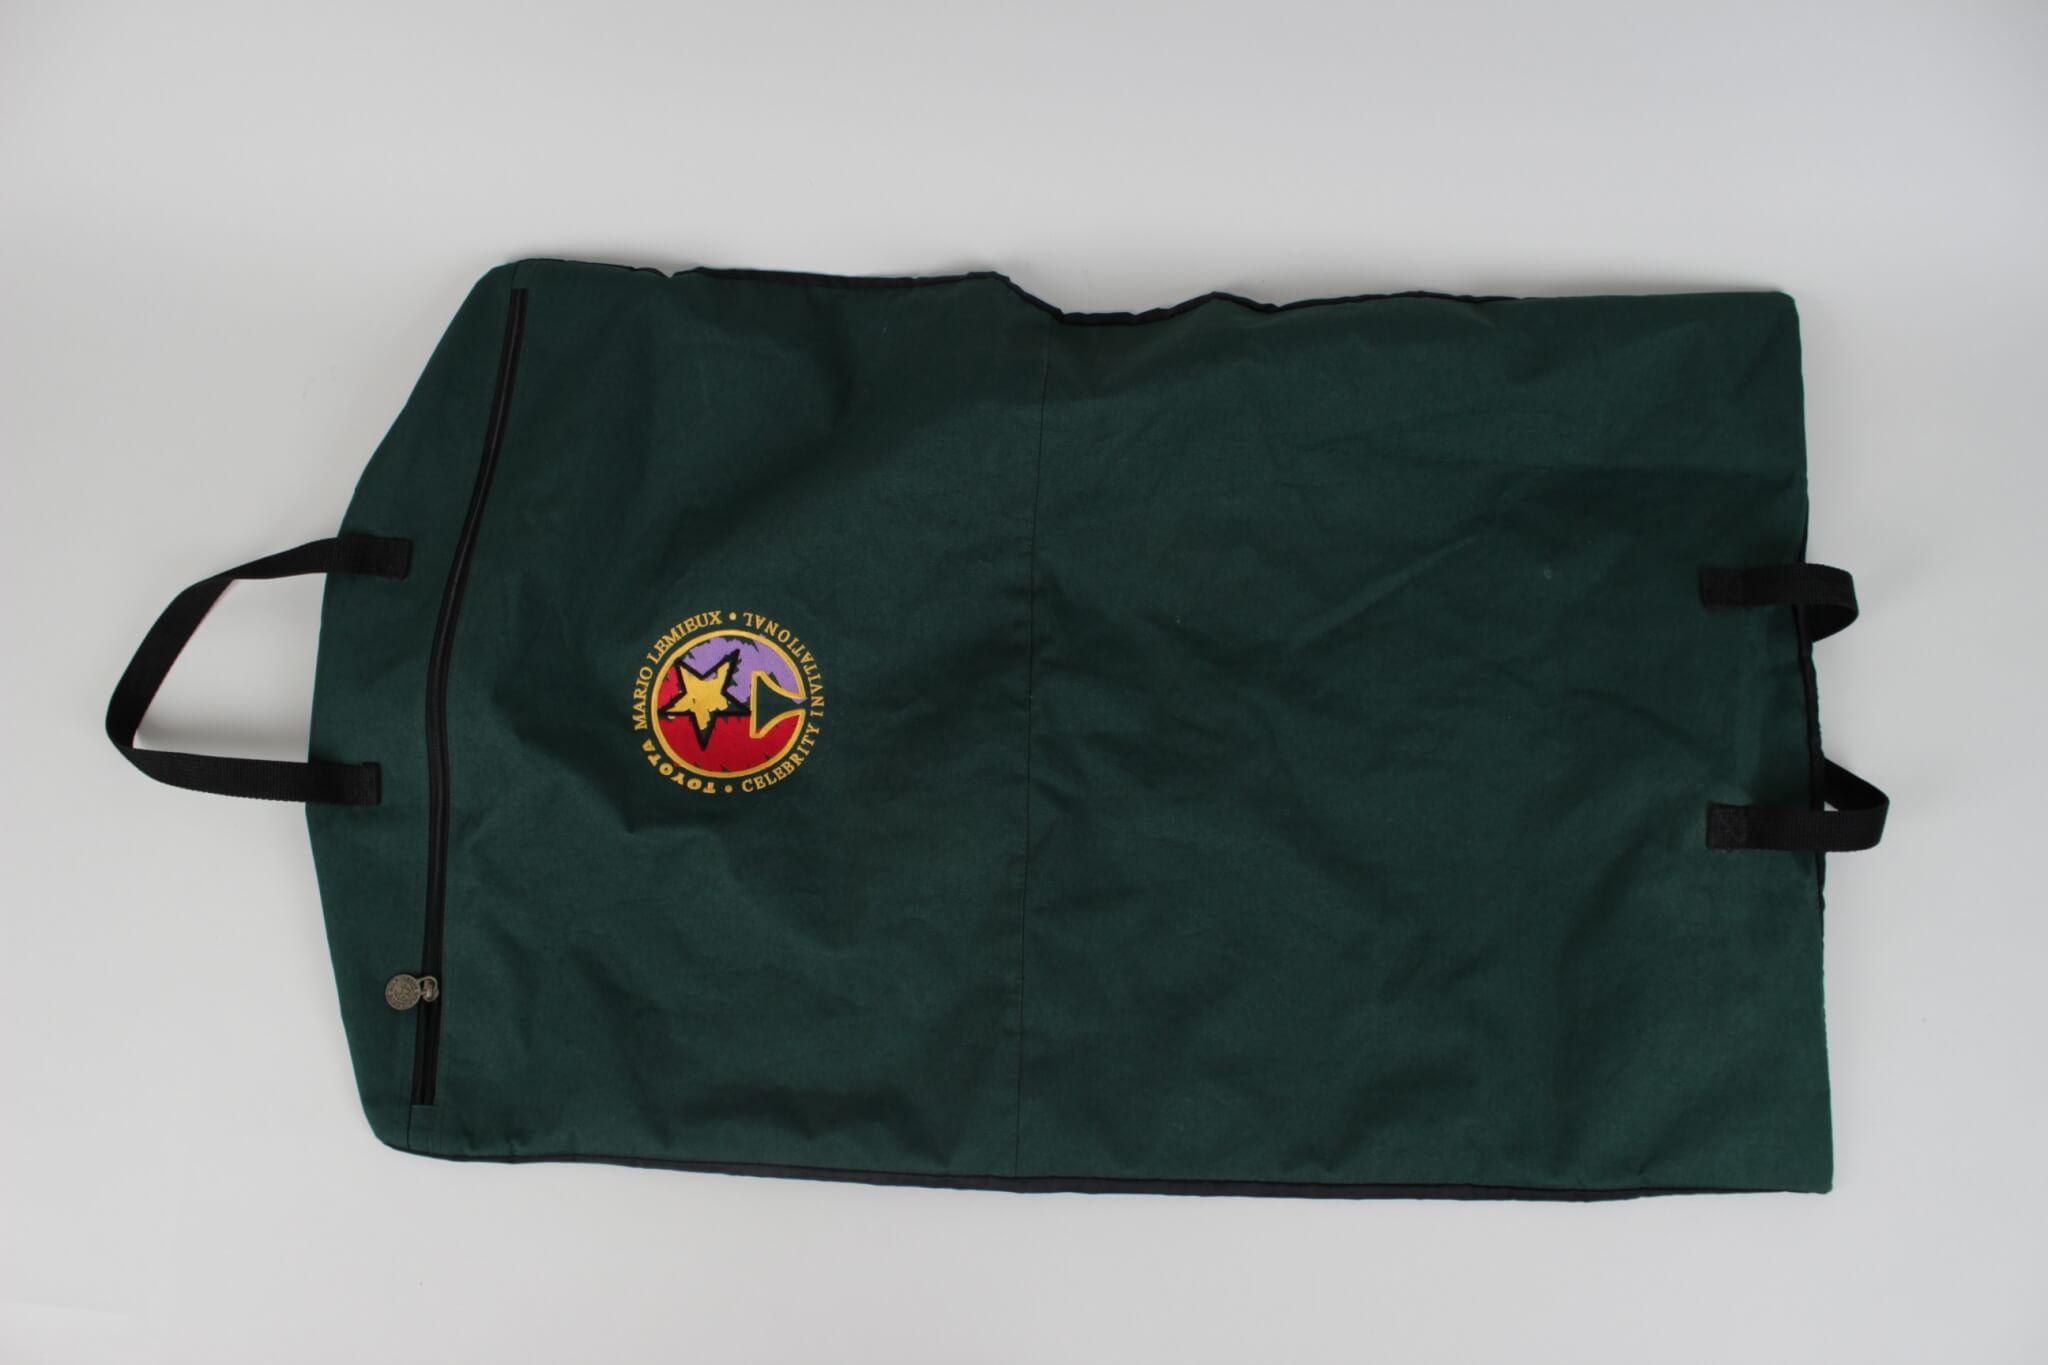 Mario Lemieux Golf Tournament Garment Bag51579_01